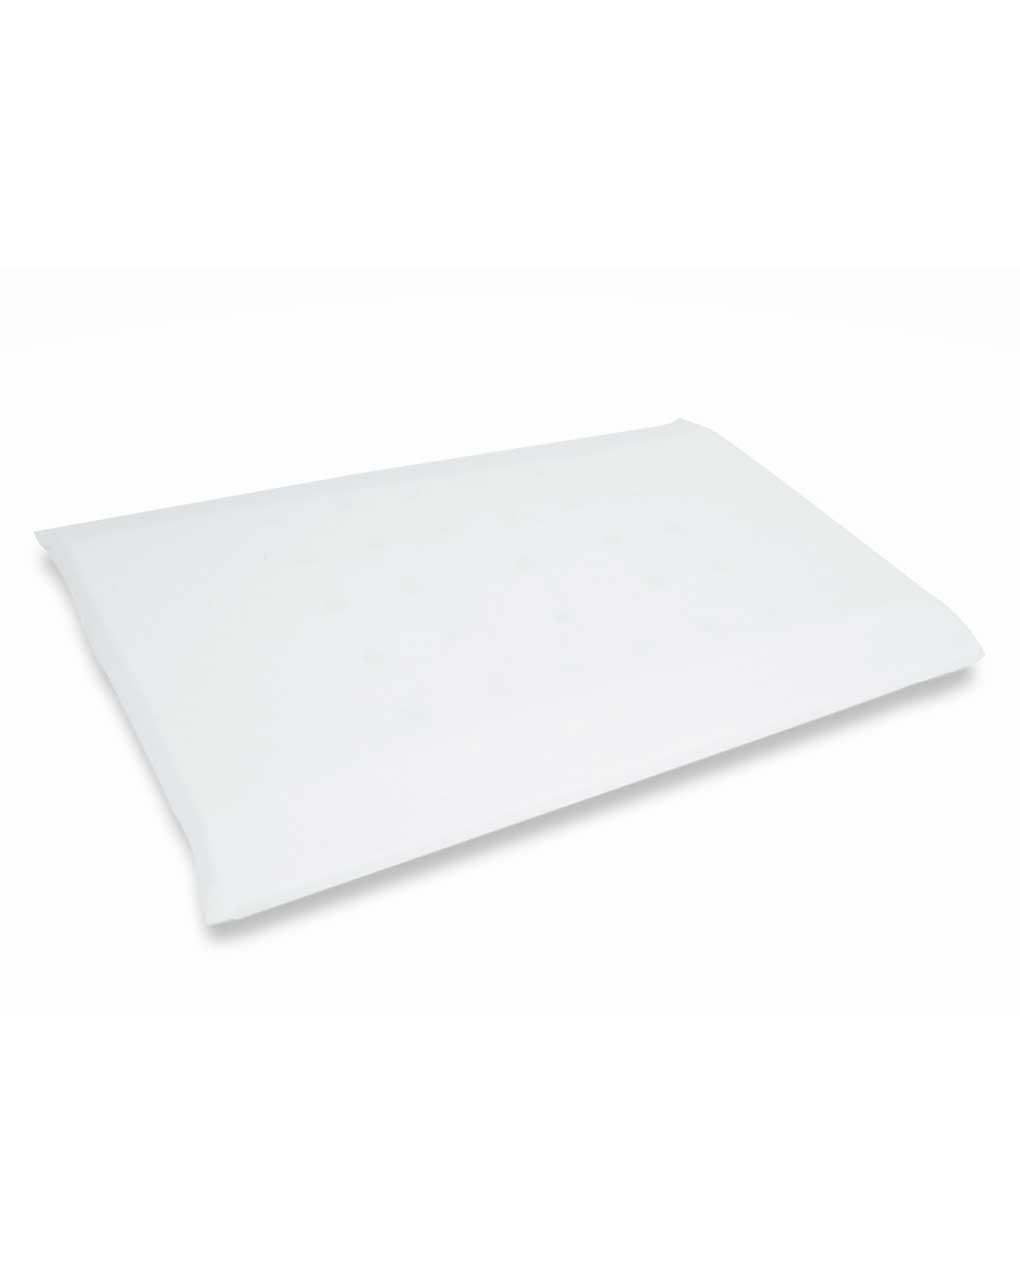 Almofada respirável 30x50 cm - Giordani